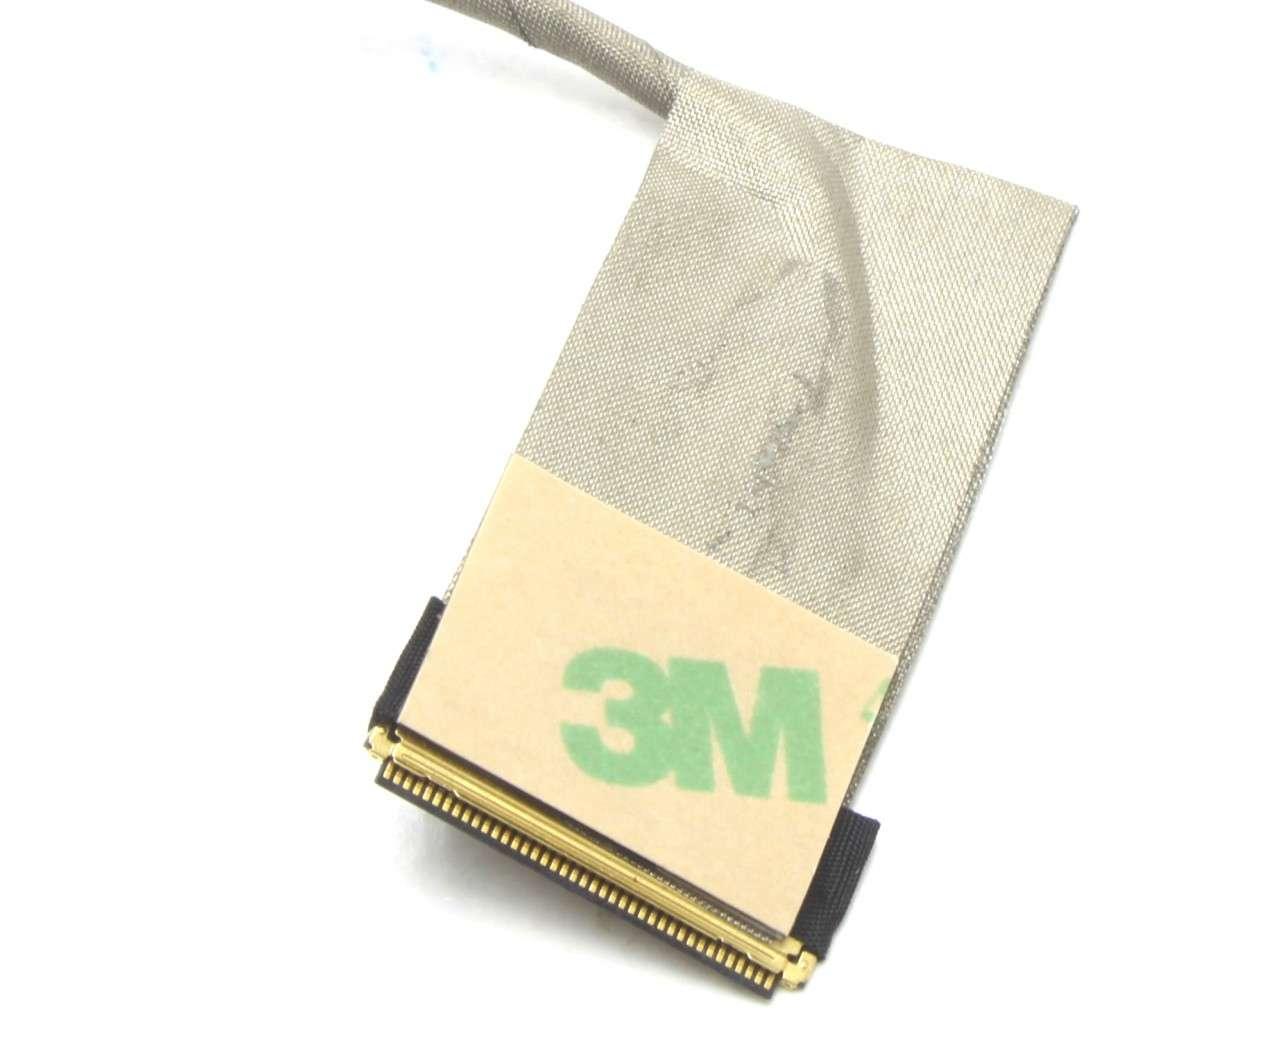 Cablu video LVDS Sony DD0HK1LC000 Part Number DD0HK1LC000 imagine powerlaptop.ro 2021